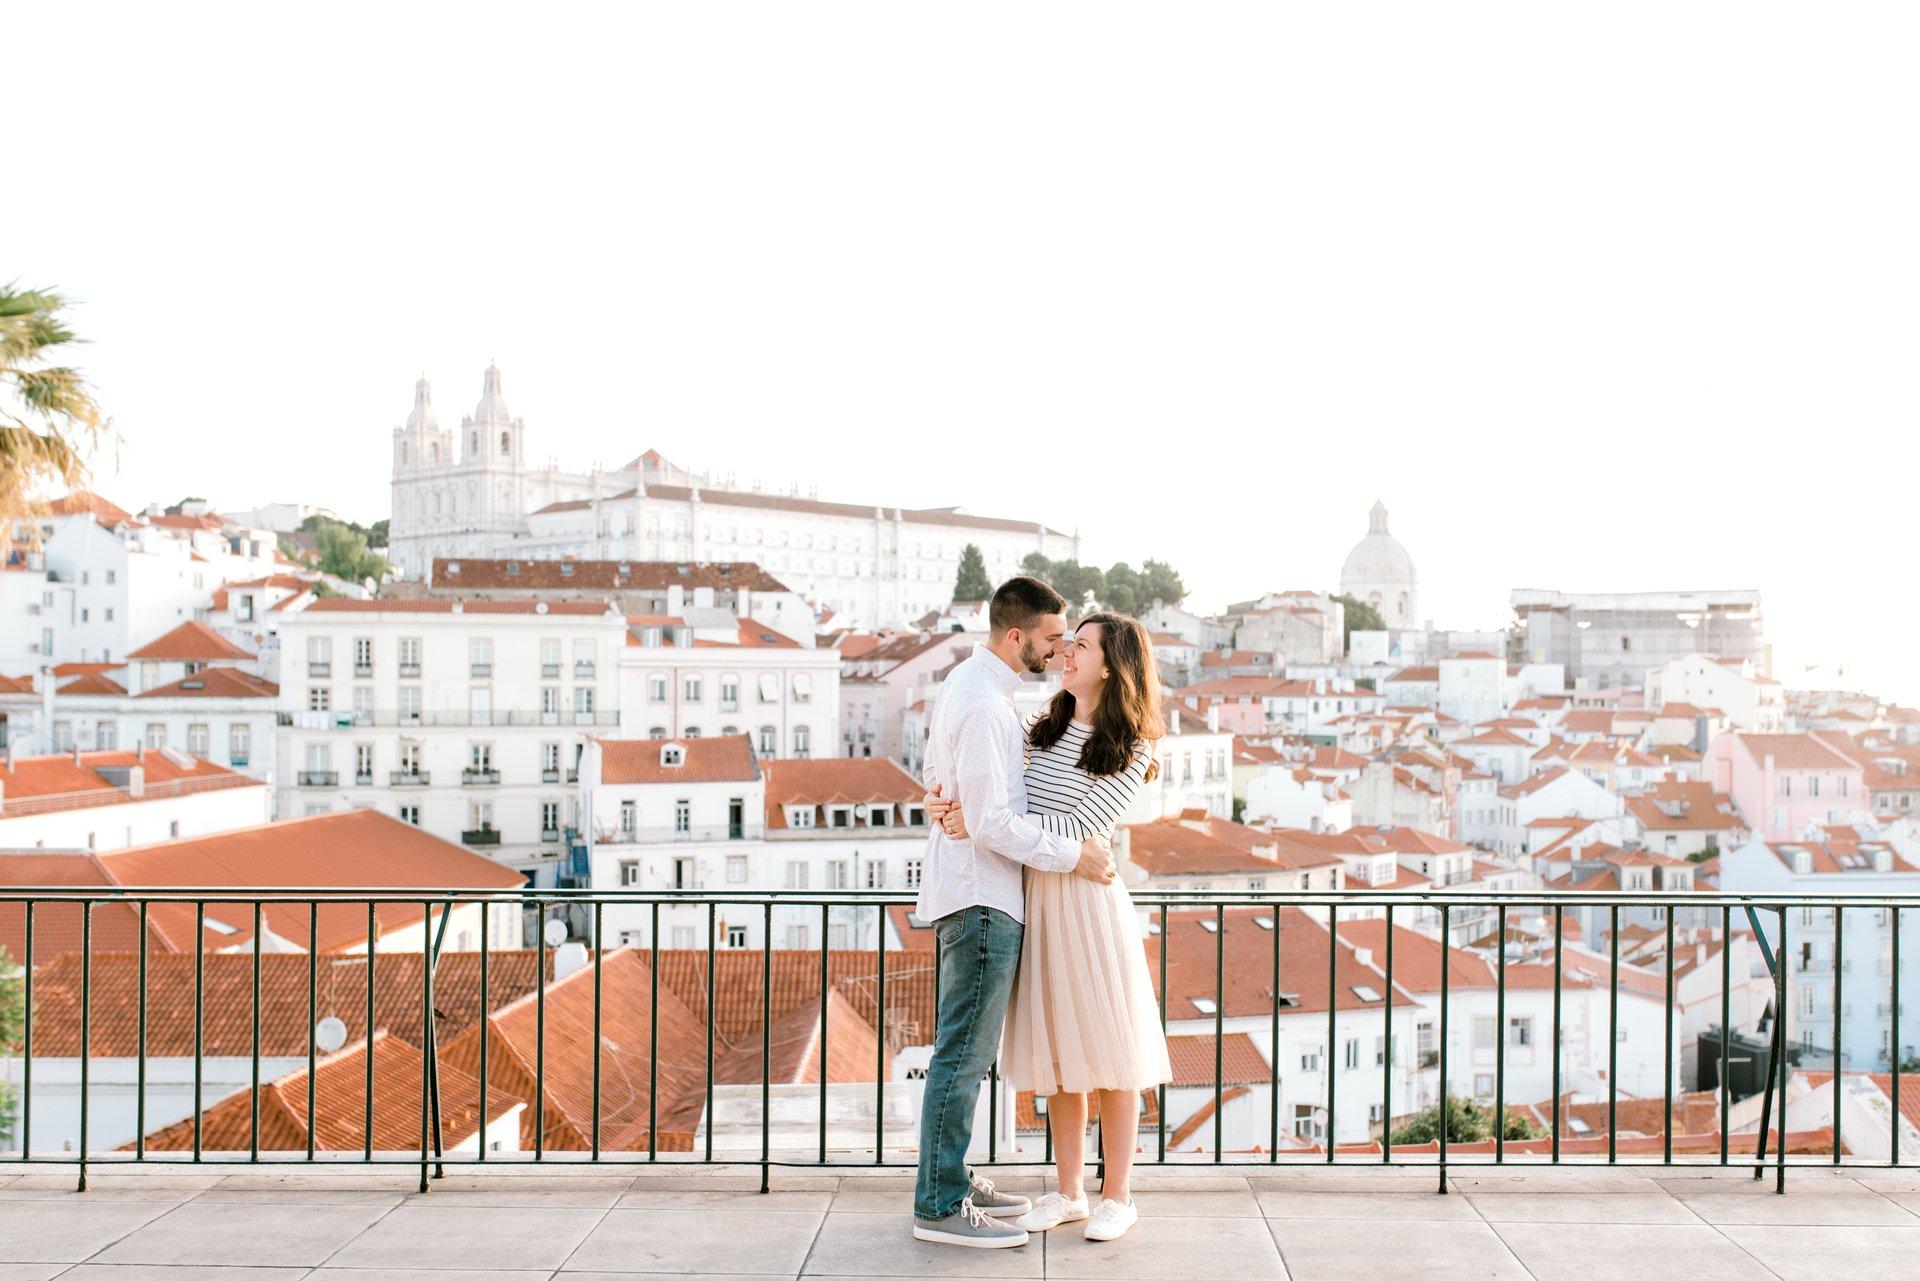 Lisbon-Portugal-travel-story-Flytographer-2